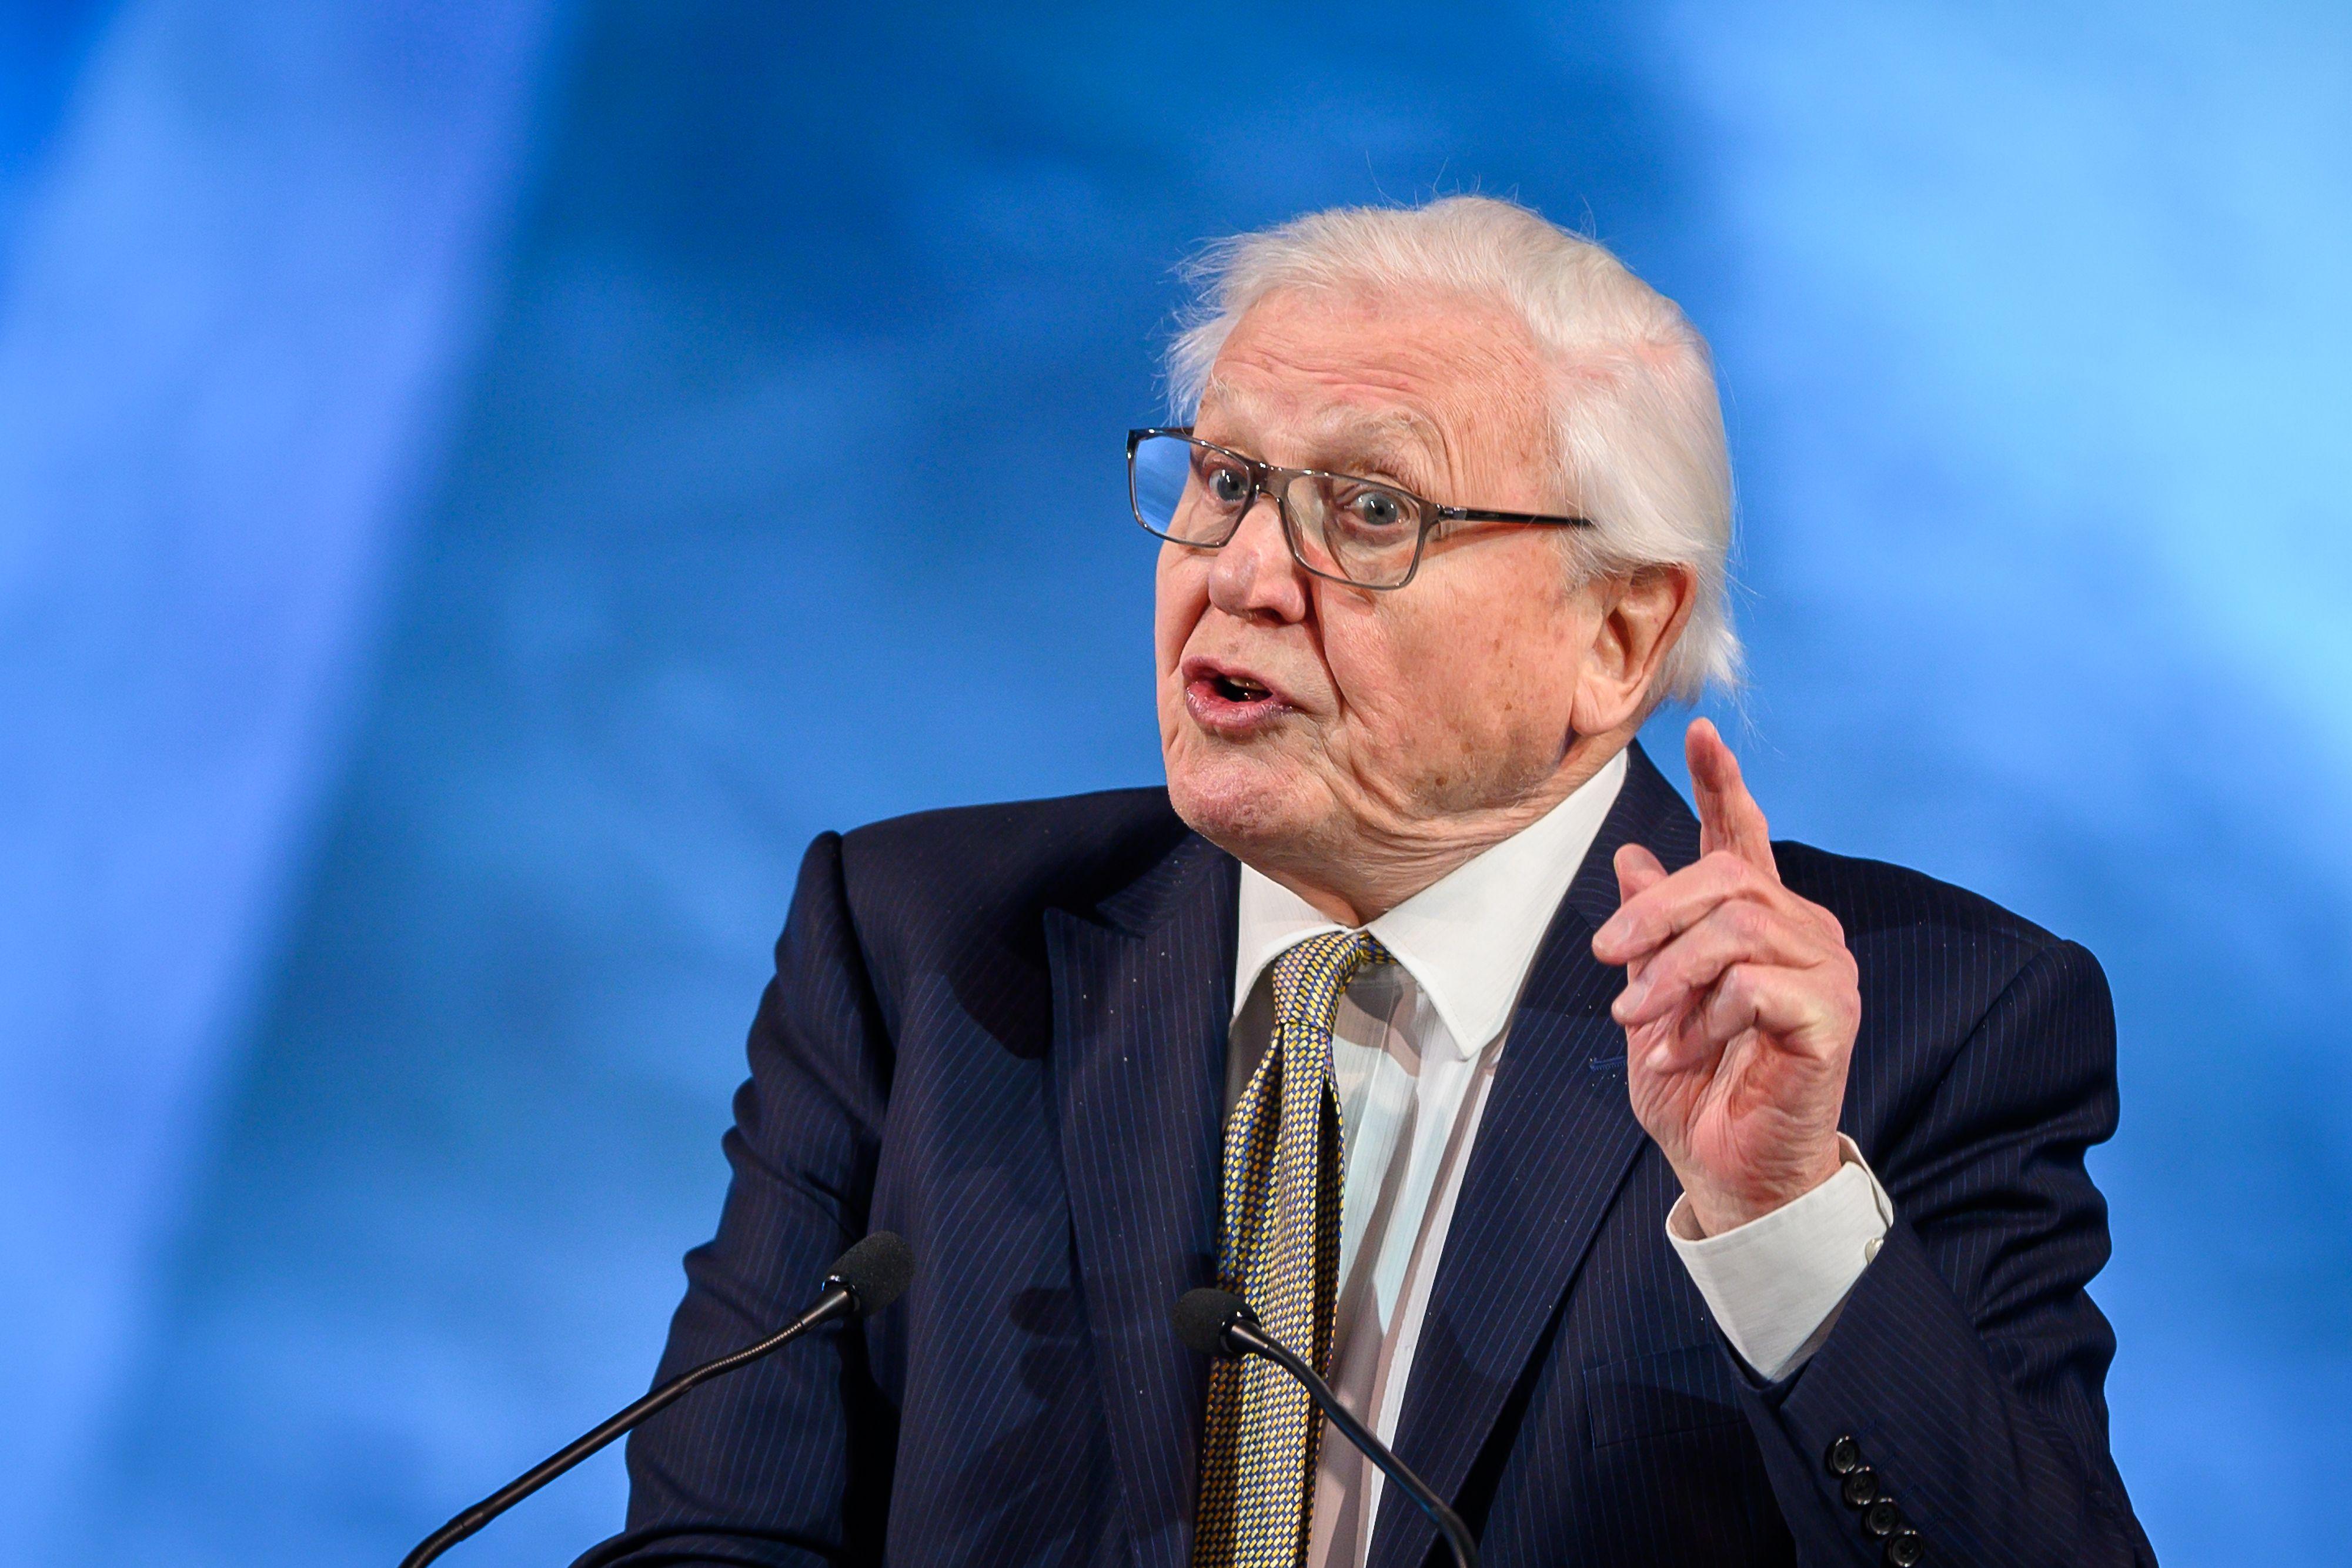 Sir David Attenborough Speaks at Davos - Bloomberg